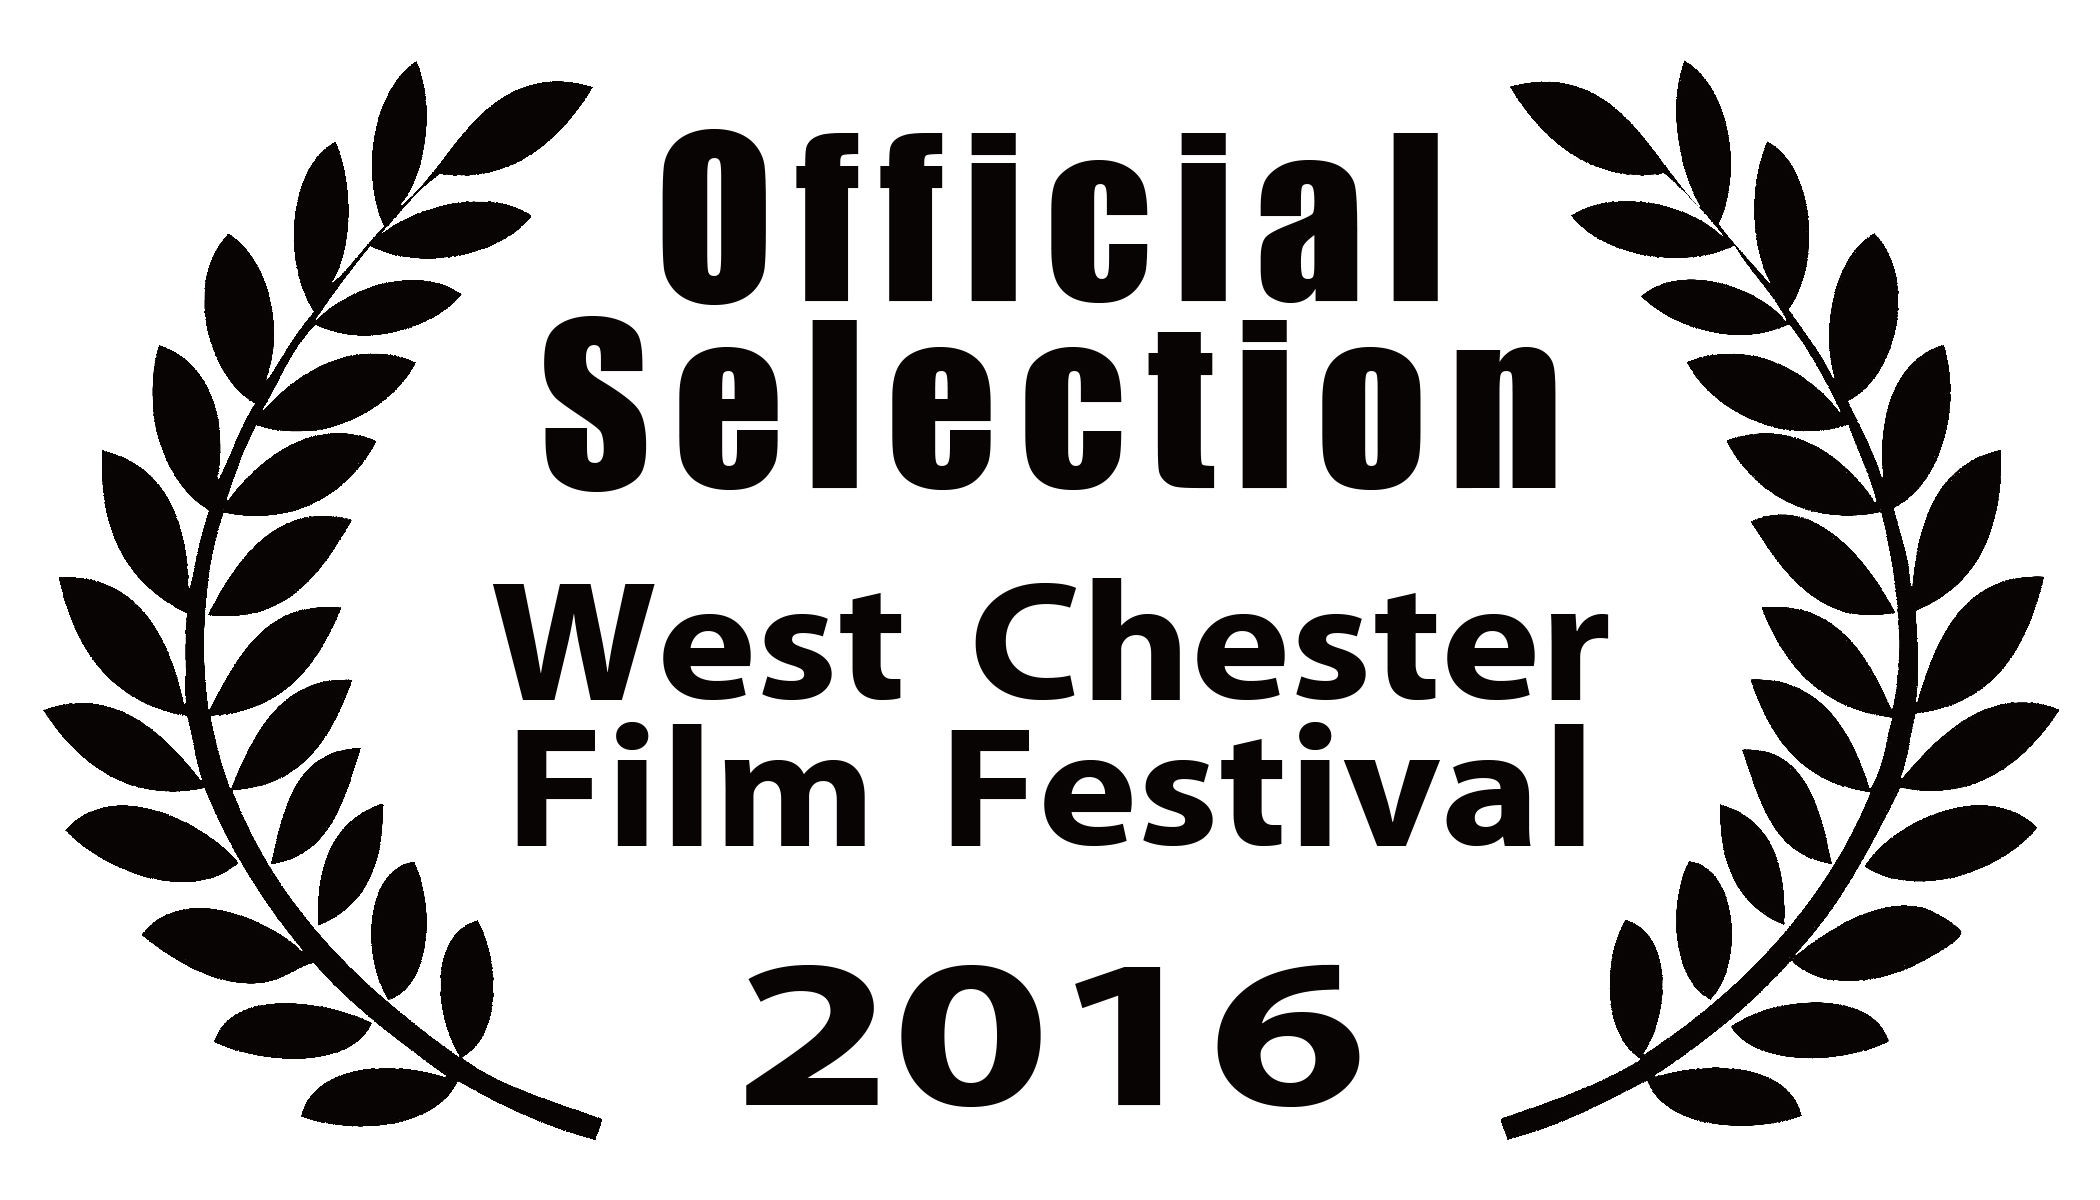 WCFF_Selection_Standard_2016.jpg